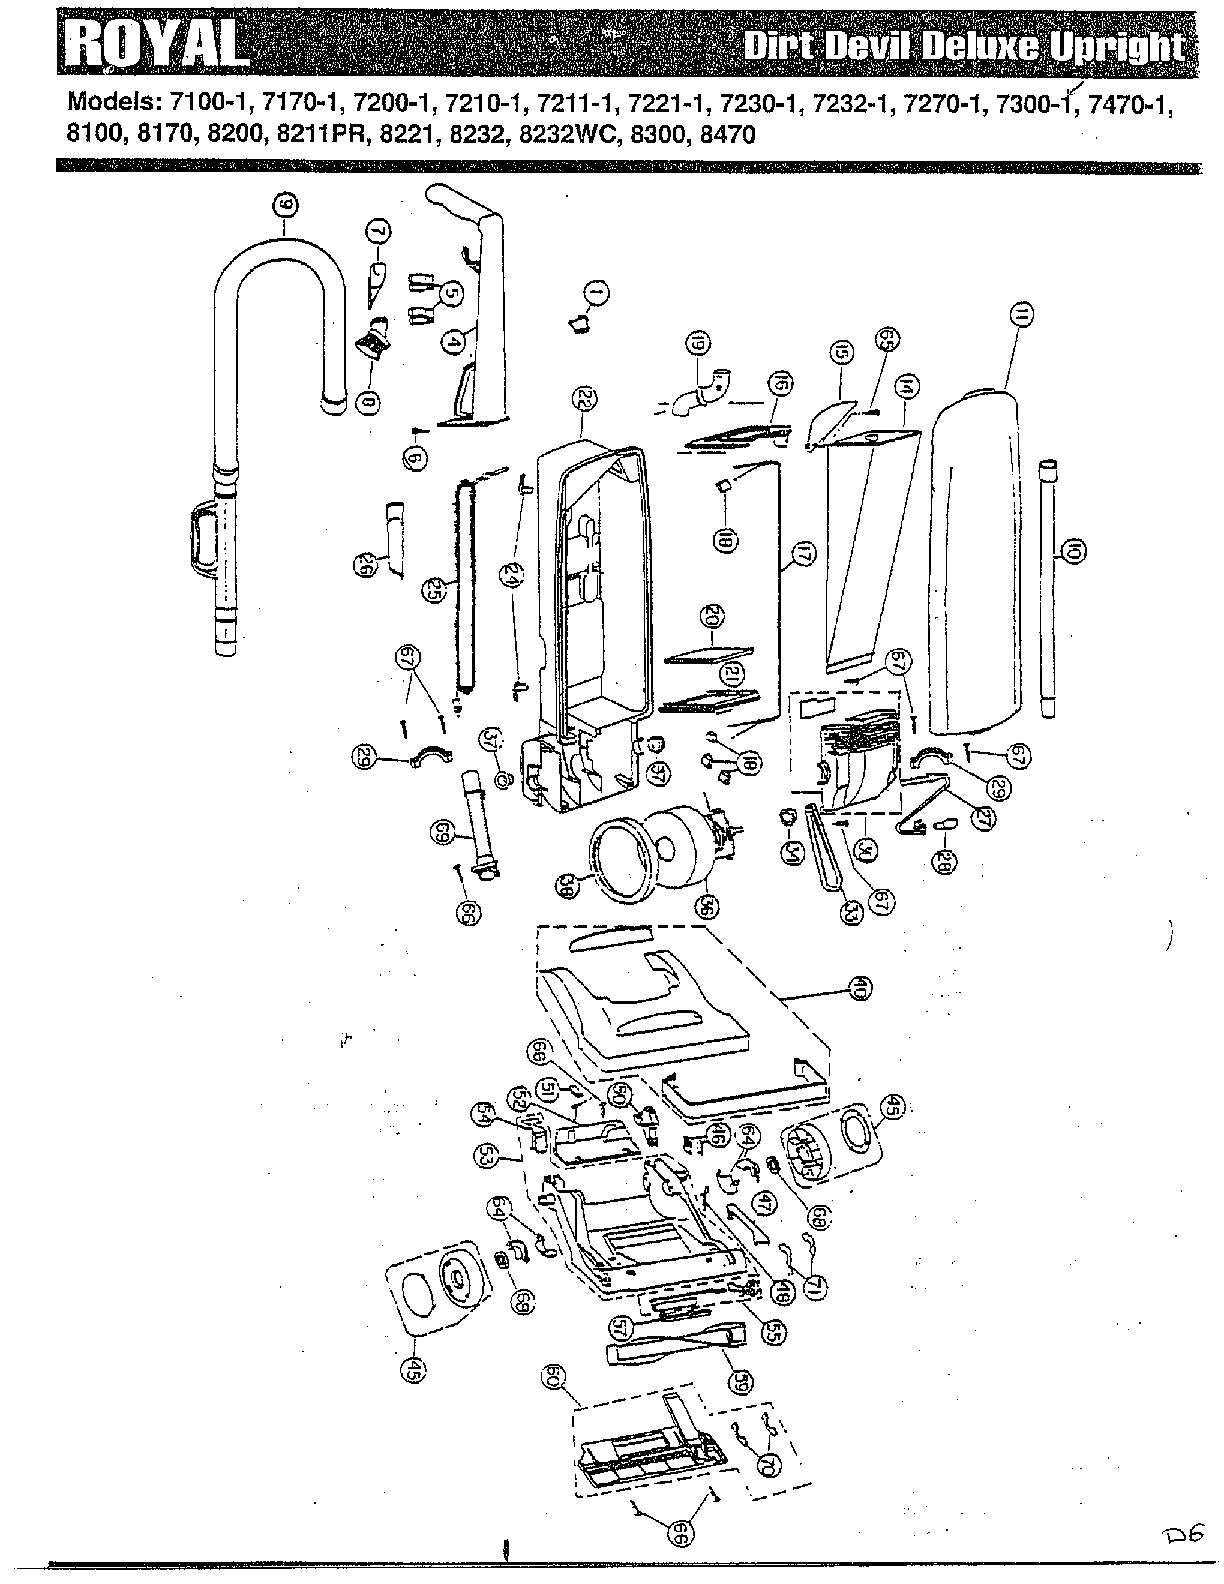 Dirt-Devil model 8200 vacuum, upright genuine parts